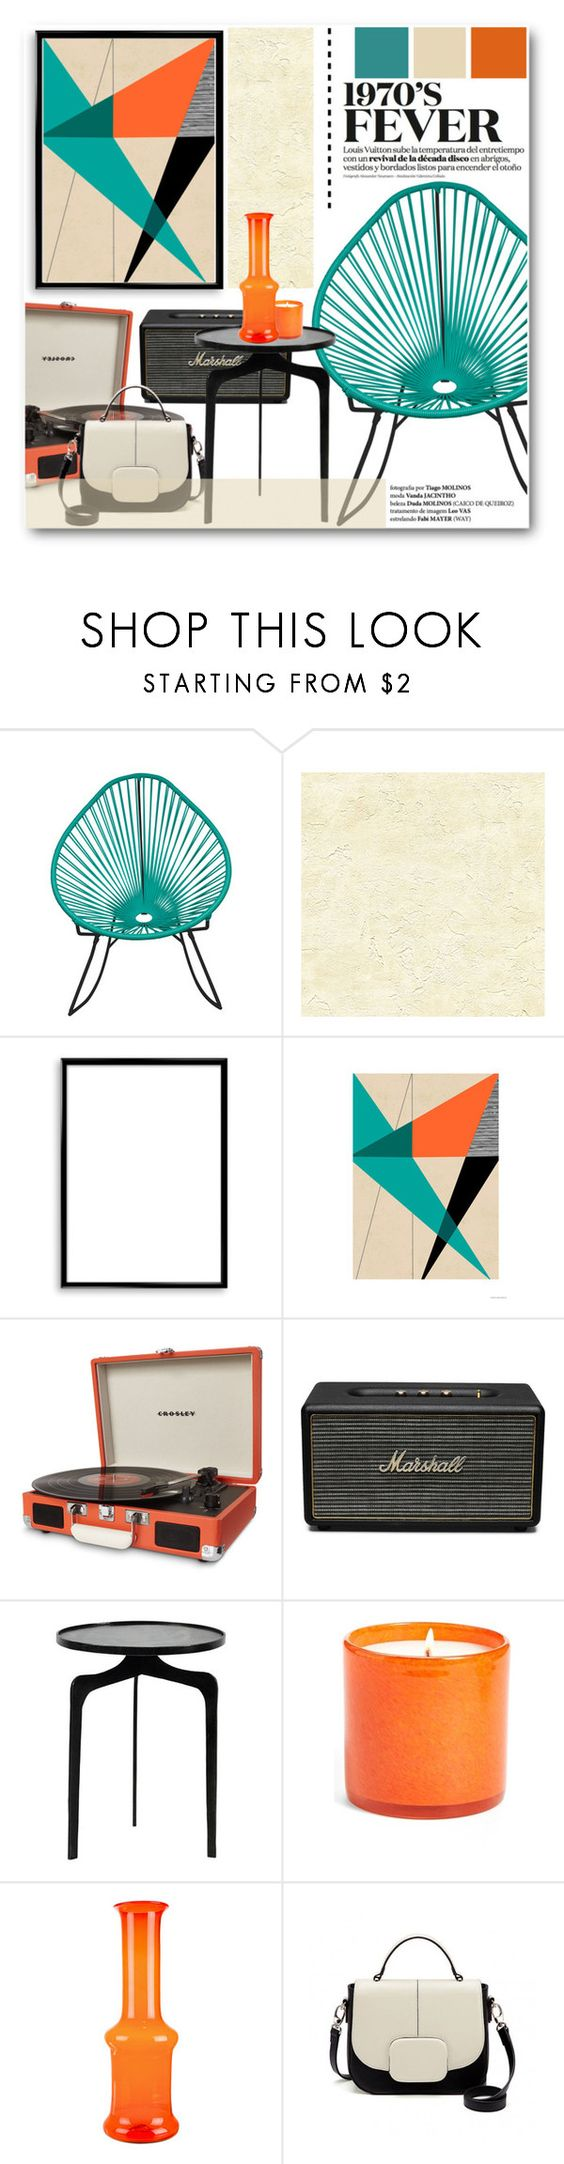 Living rooms marshalls and interior decorating on pinterest for Room decor marshalls